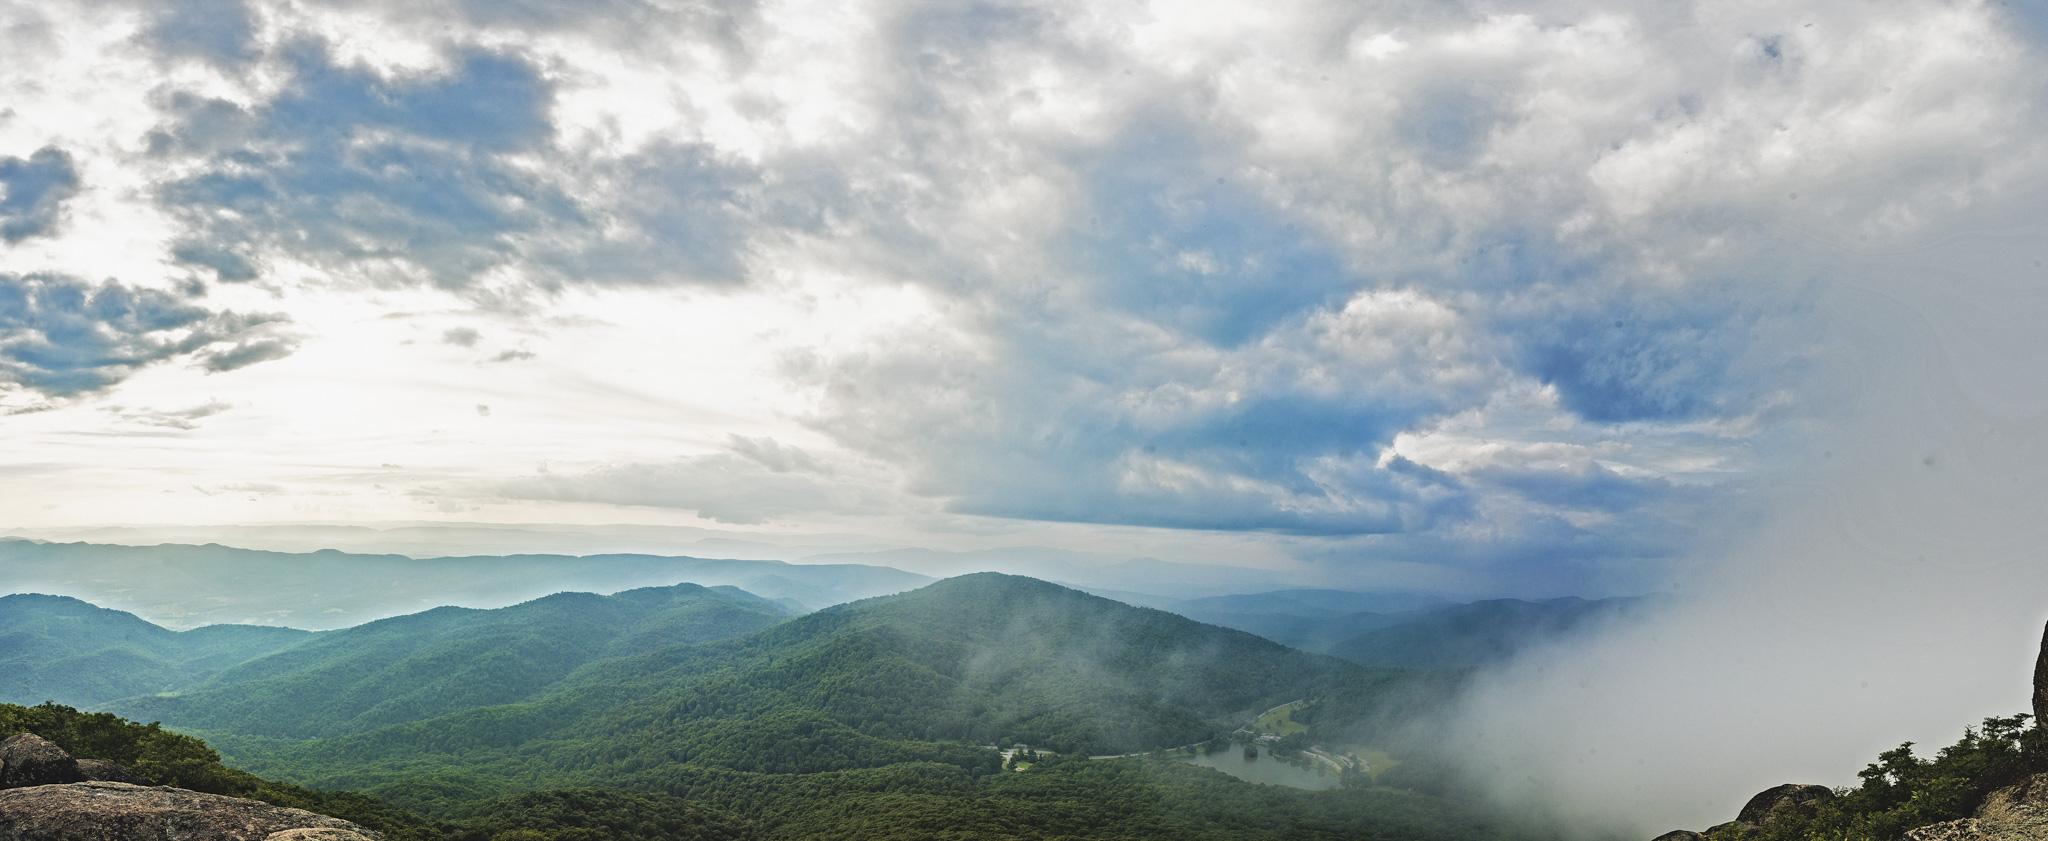 Sharptop_Mountain_Blue_Ridge_Mountains_Lynchburg_VA_1599.jpg